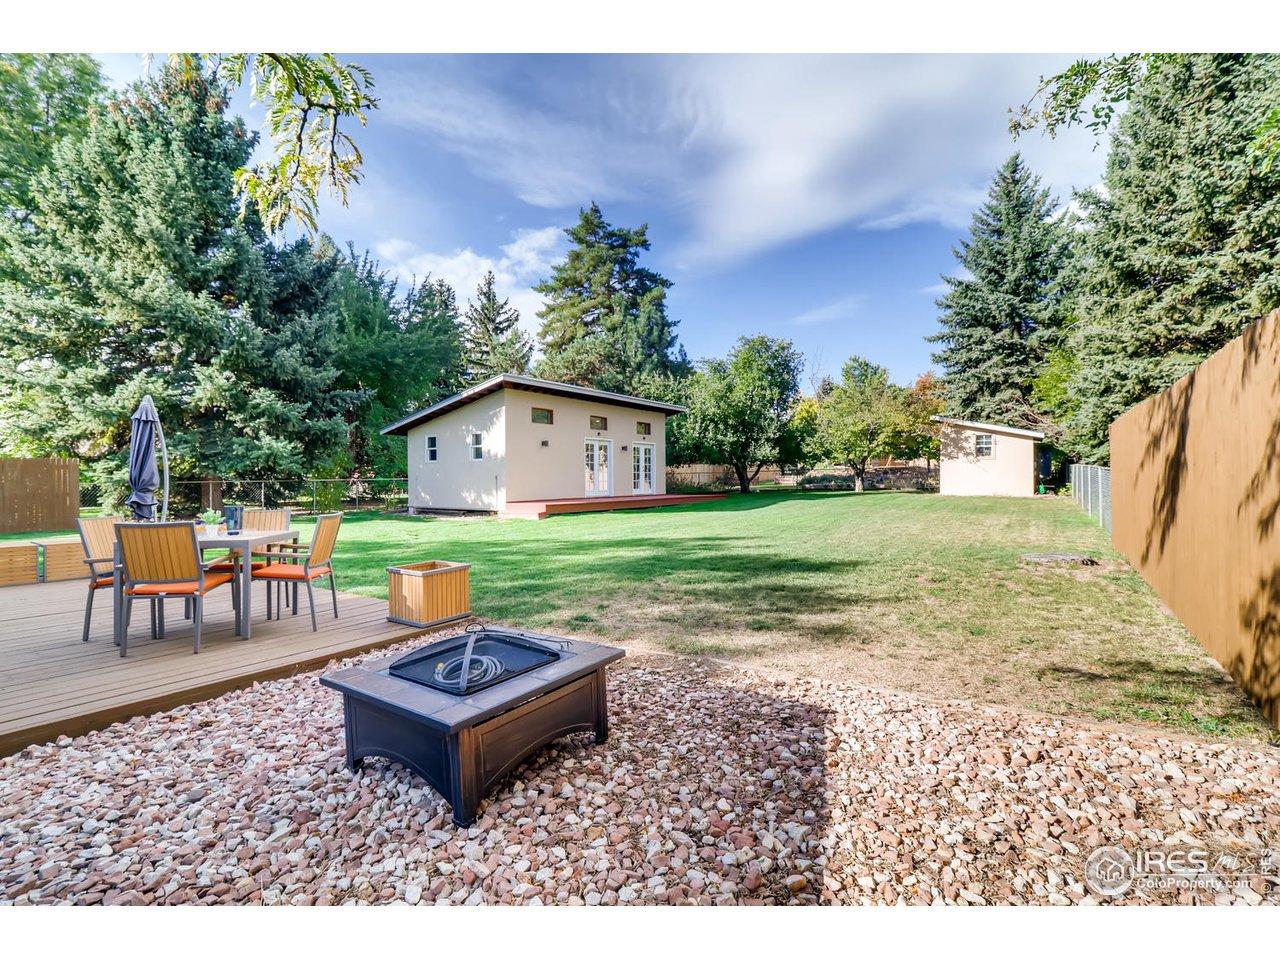 Backyard oasis - 12,981 sq ft lot